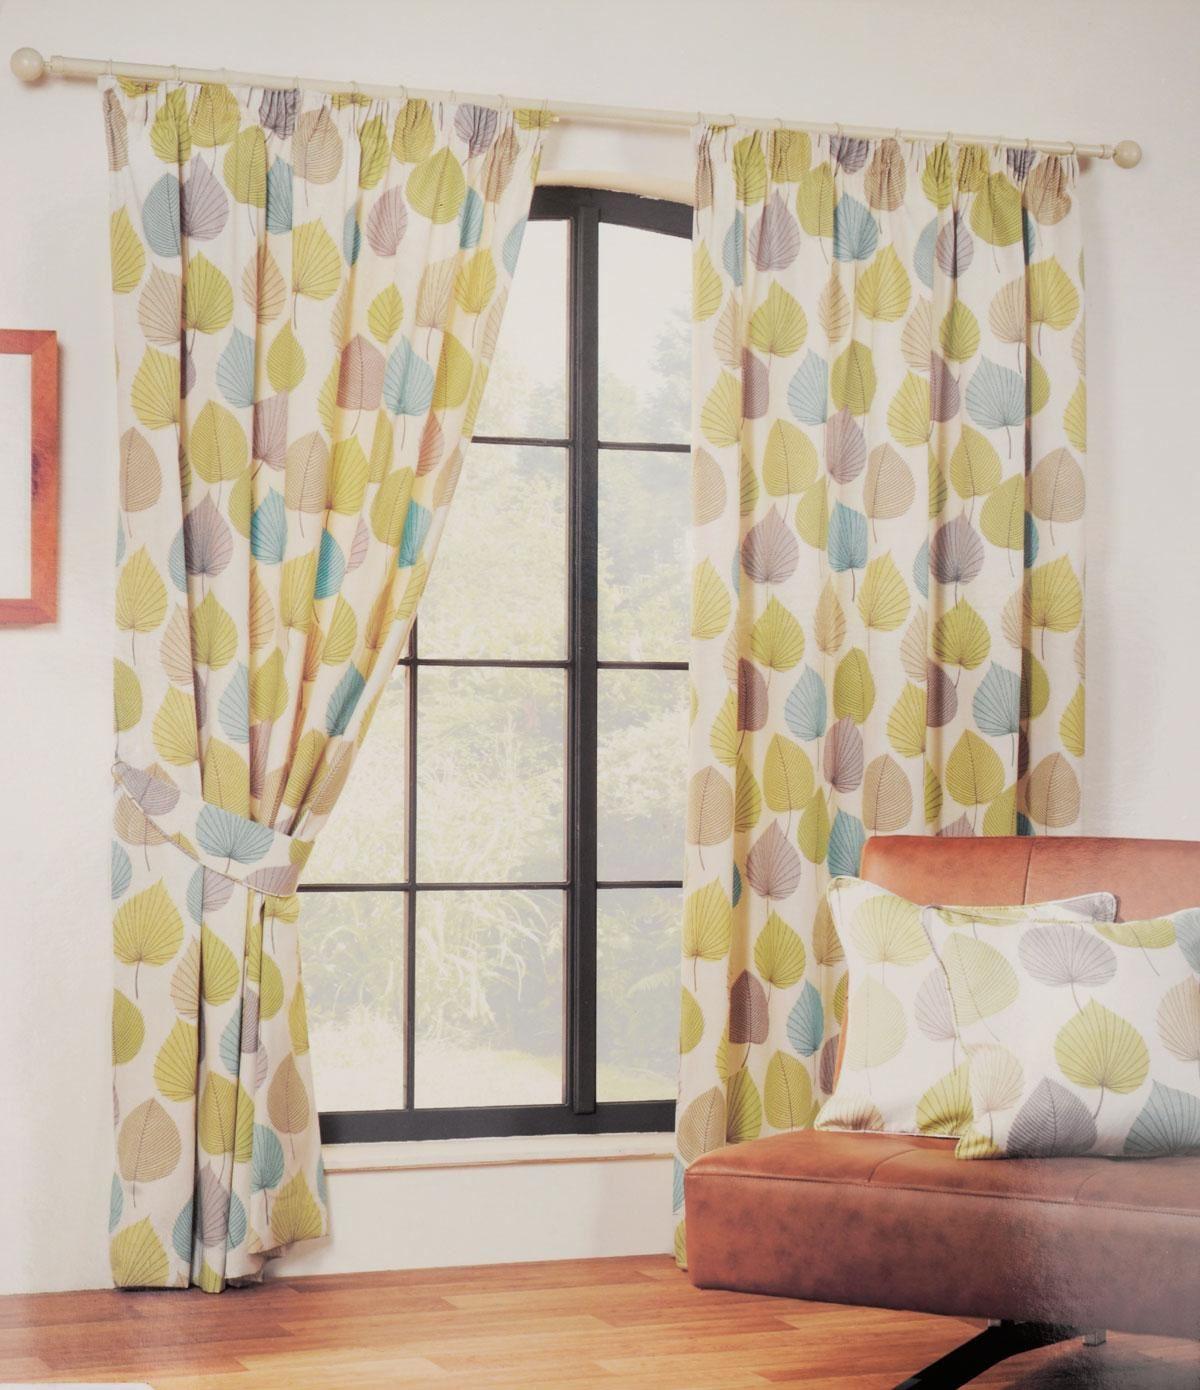 Sundour Inglewood Leaf Green Pencil Pleat Lined Ready Made Curtains Inc Tiebacks Ebay